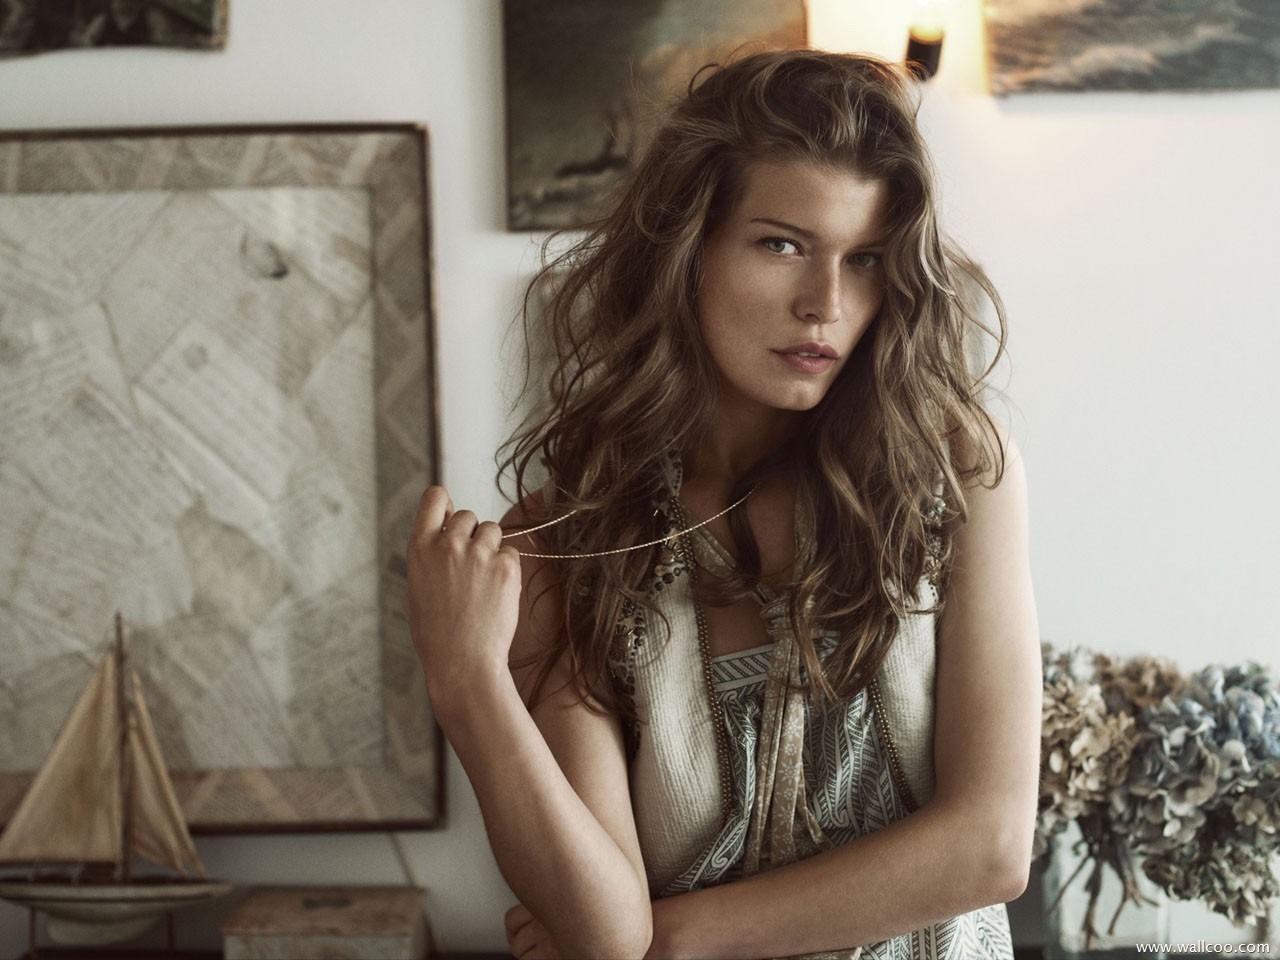 Description: Danish supermodel Louise Pedersen summer wallpaper 09 ... Supermodel